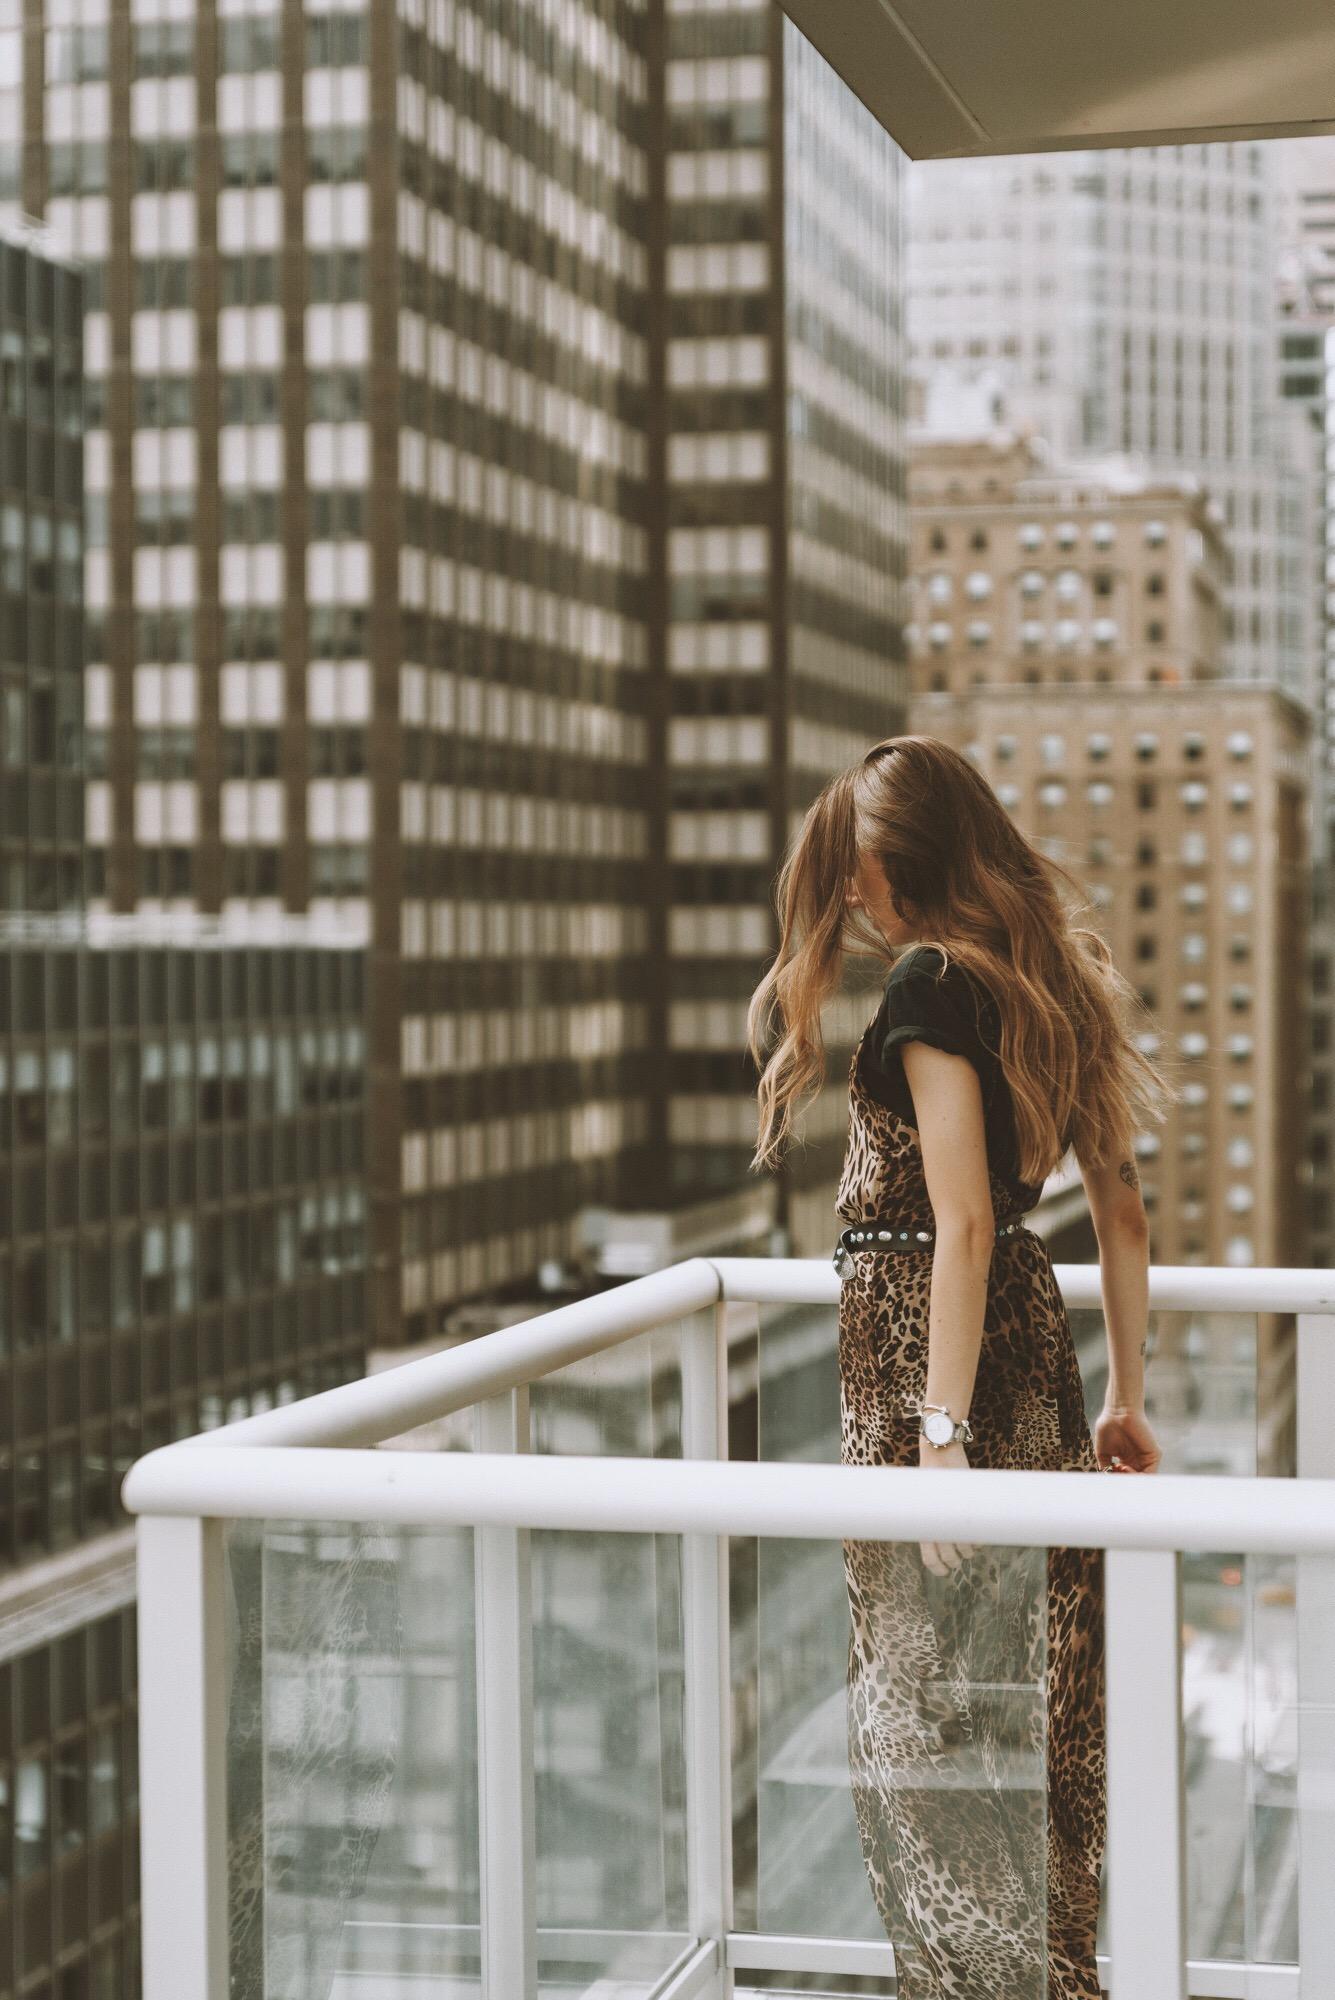 New York City Love Letter | Lisa Fiege